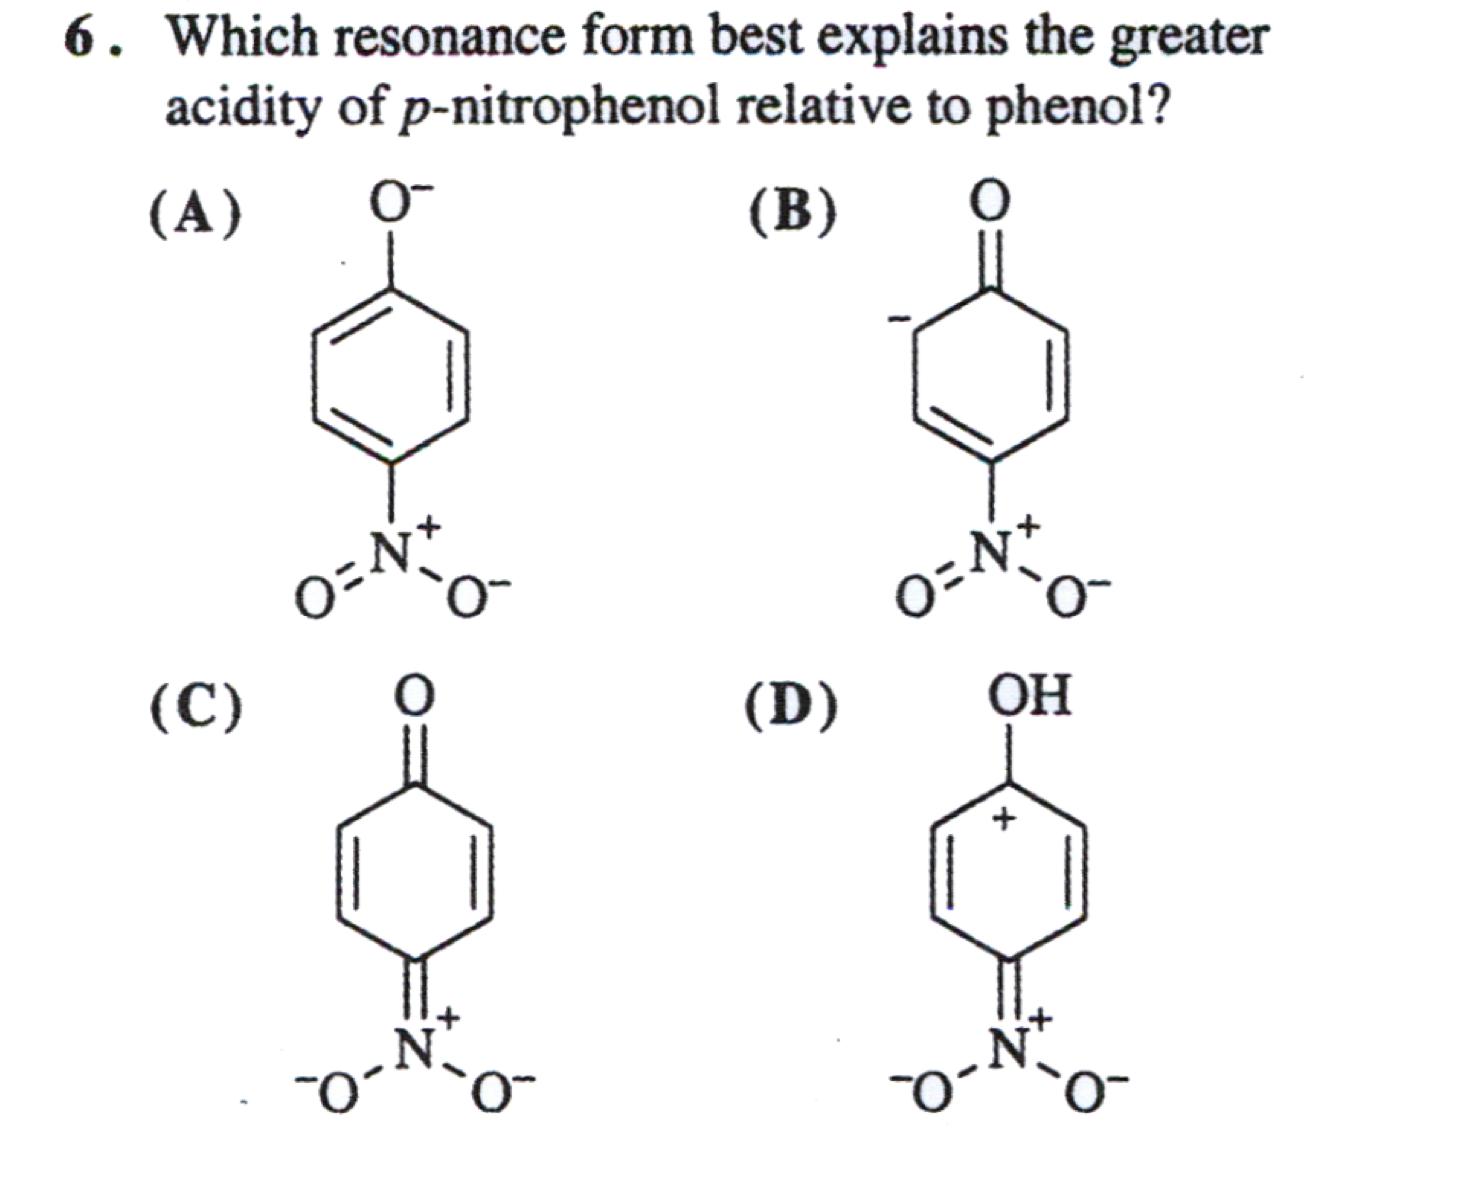 organic chemistry which resonance form best expl com 6 which resonance form best explains the greater acidity of p nitrophenol relative to